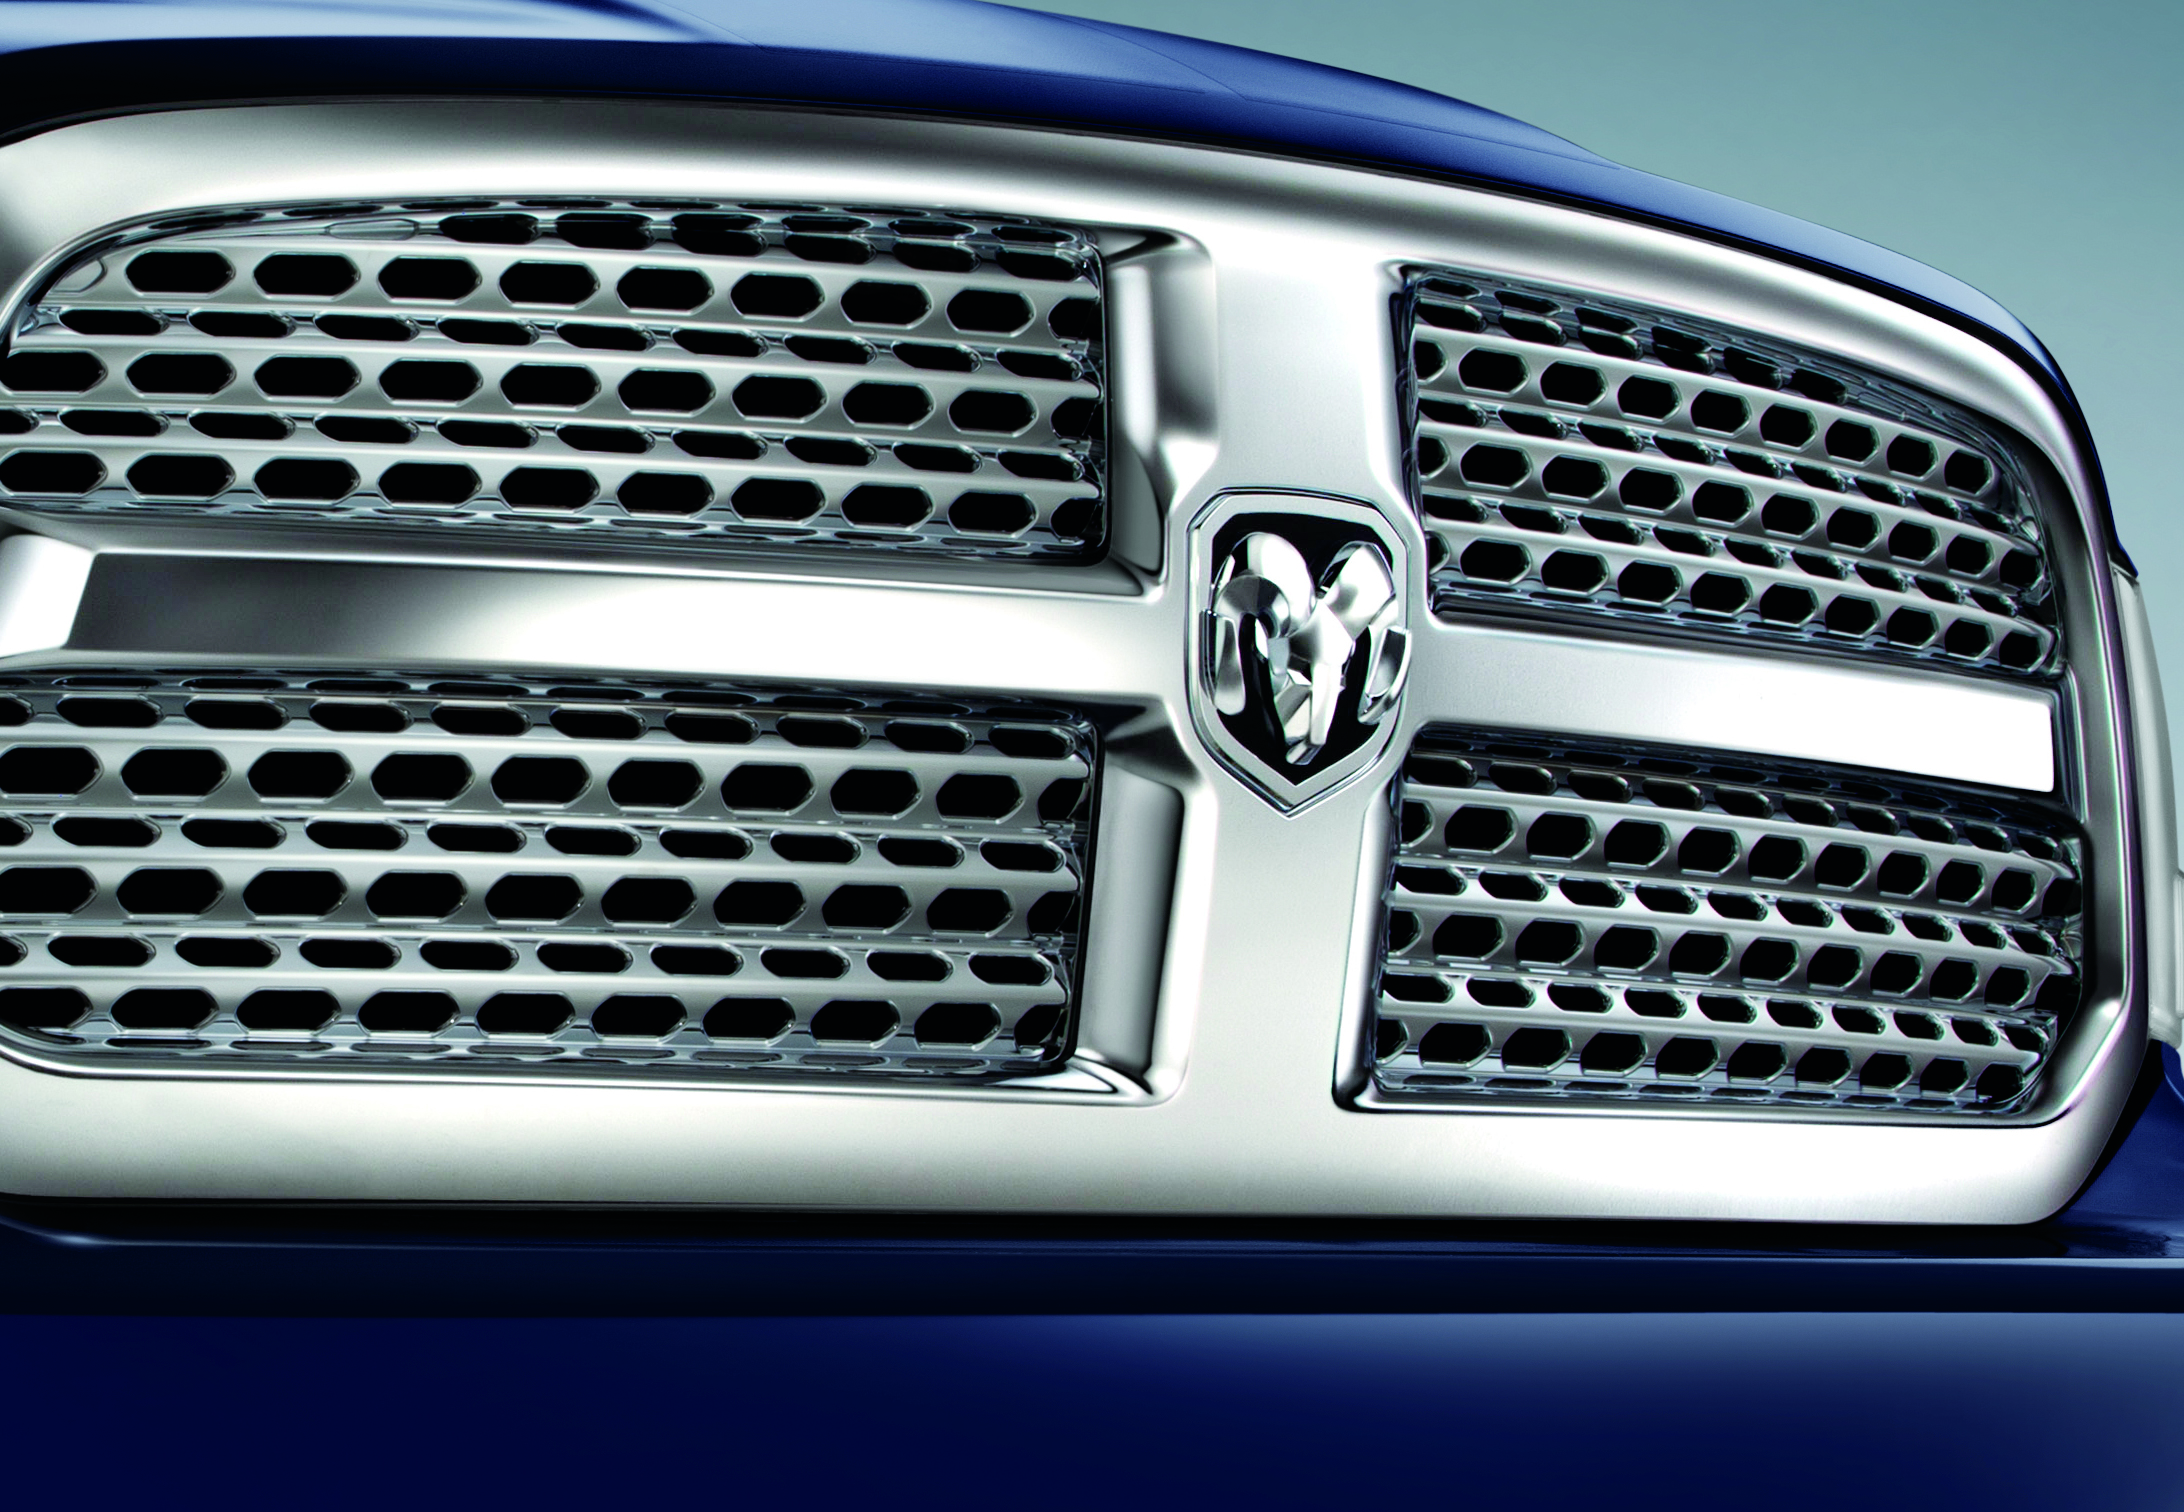 Mopar accessories for all-new Ram 1500 Chrome Horizontal Grille Dodge Ram